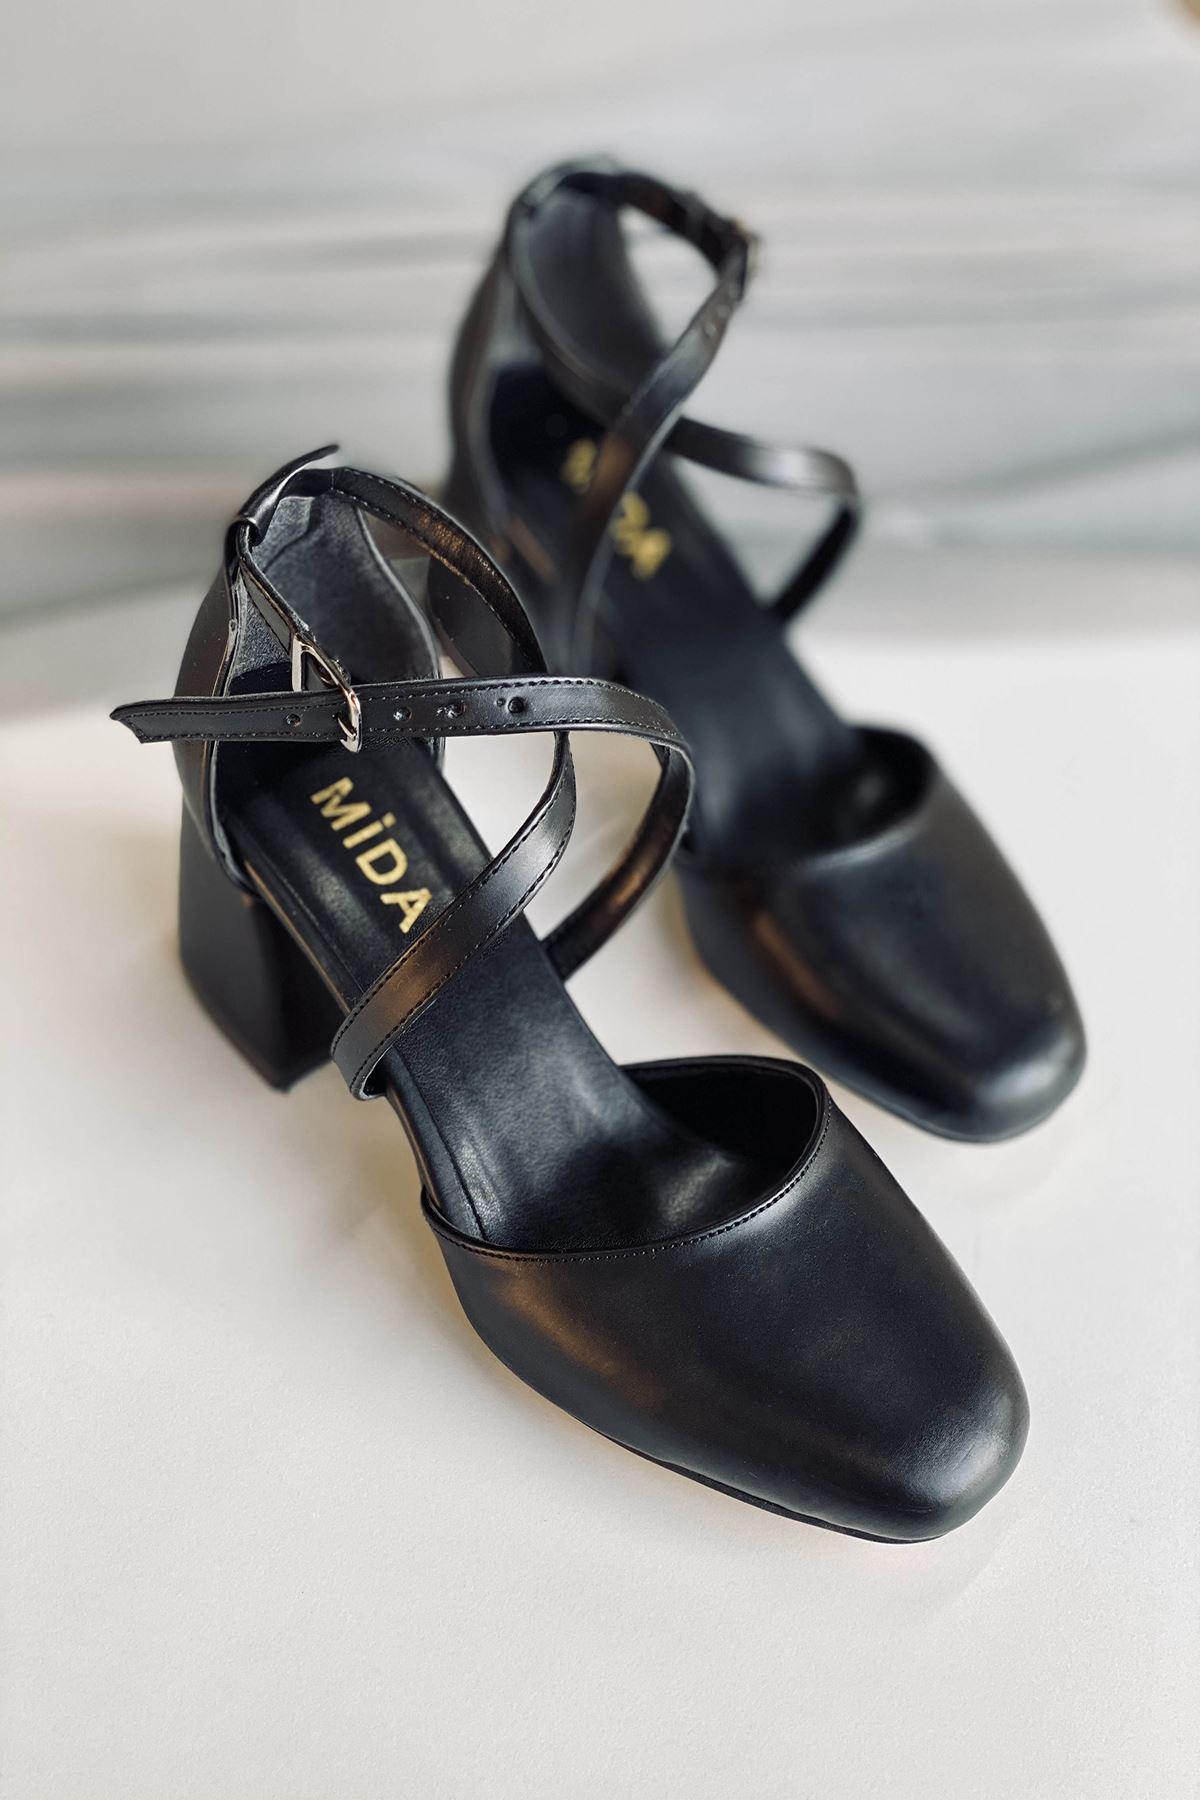 Y191 Siyah Deri Topuklu Ayakkabı